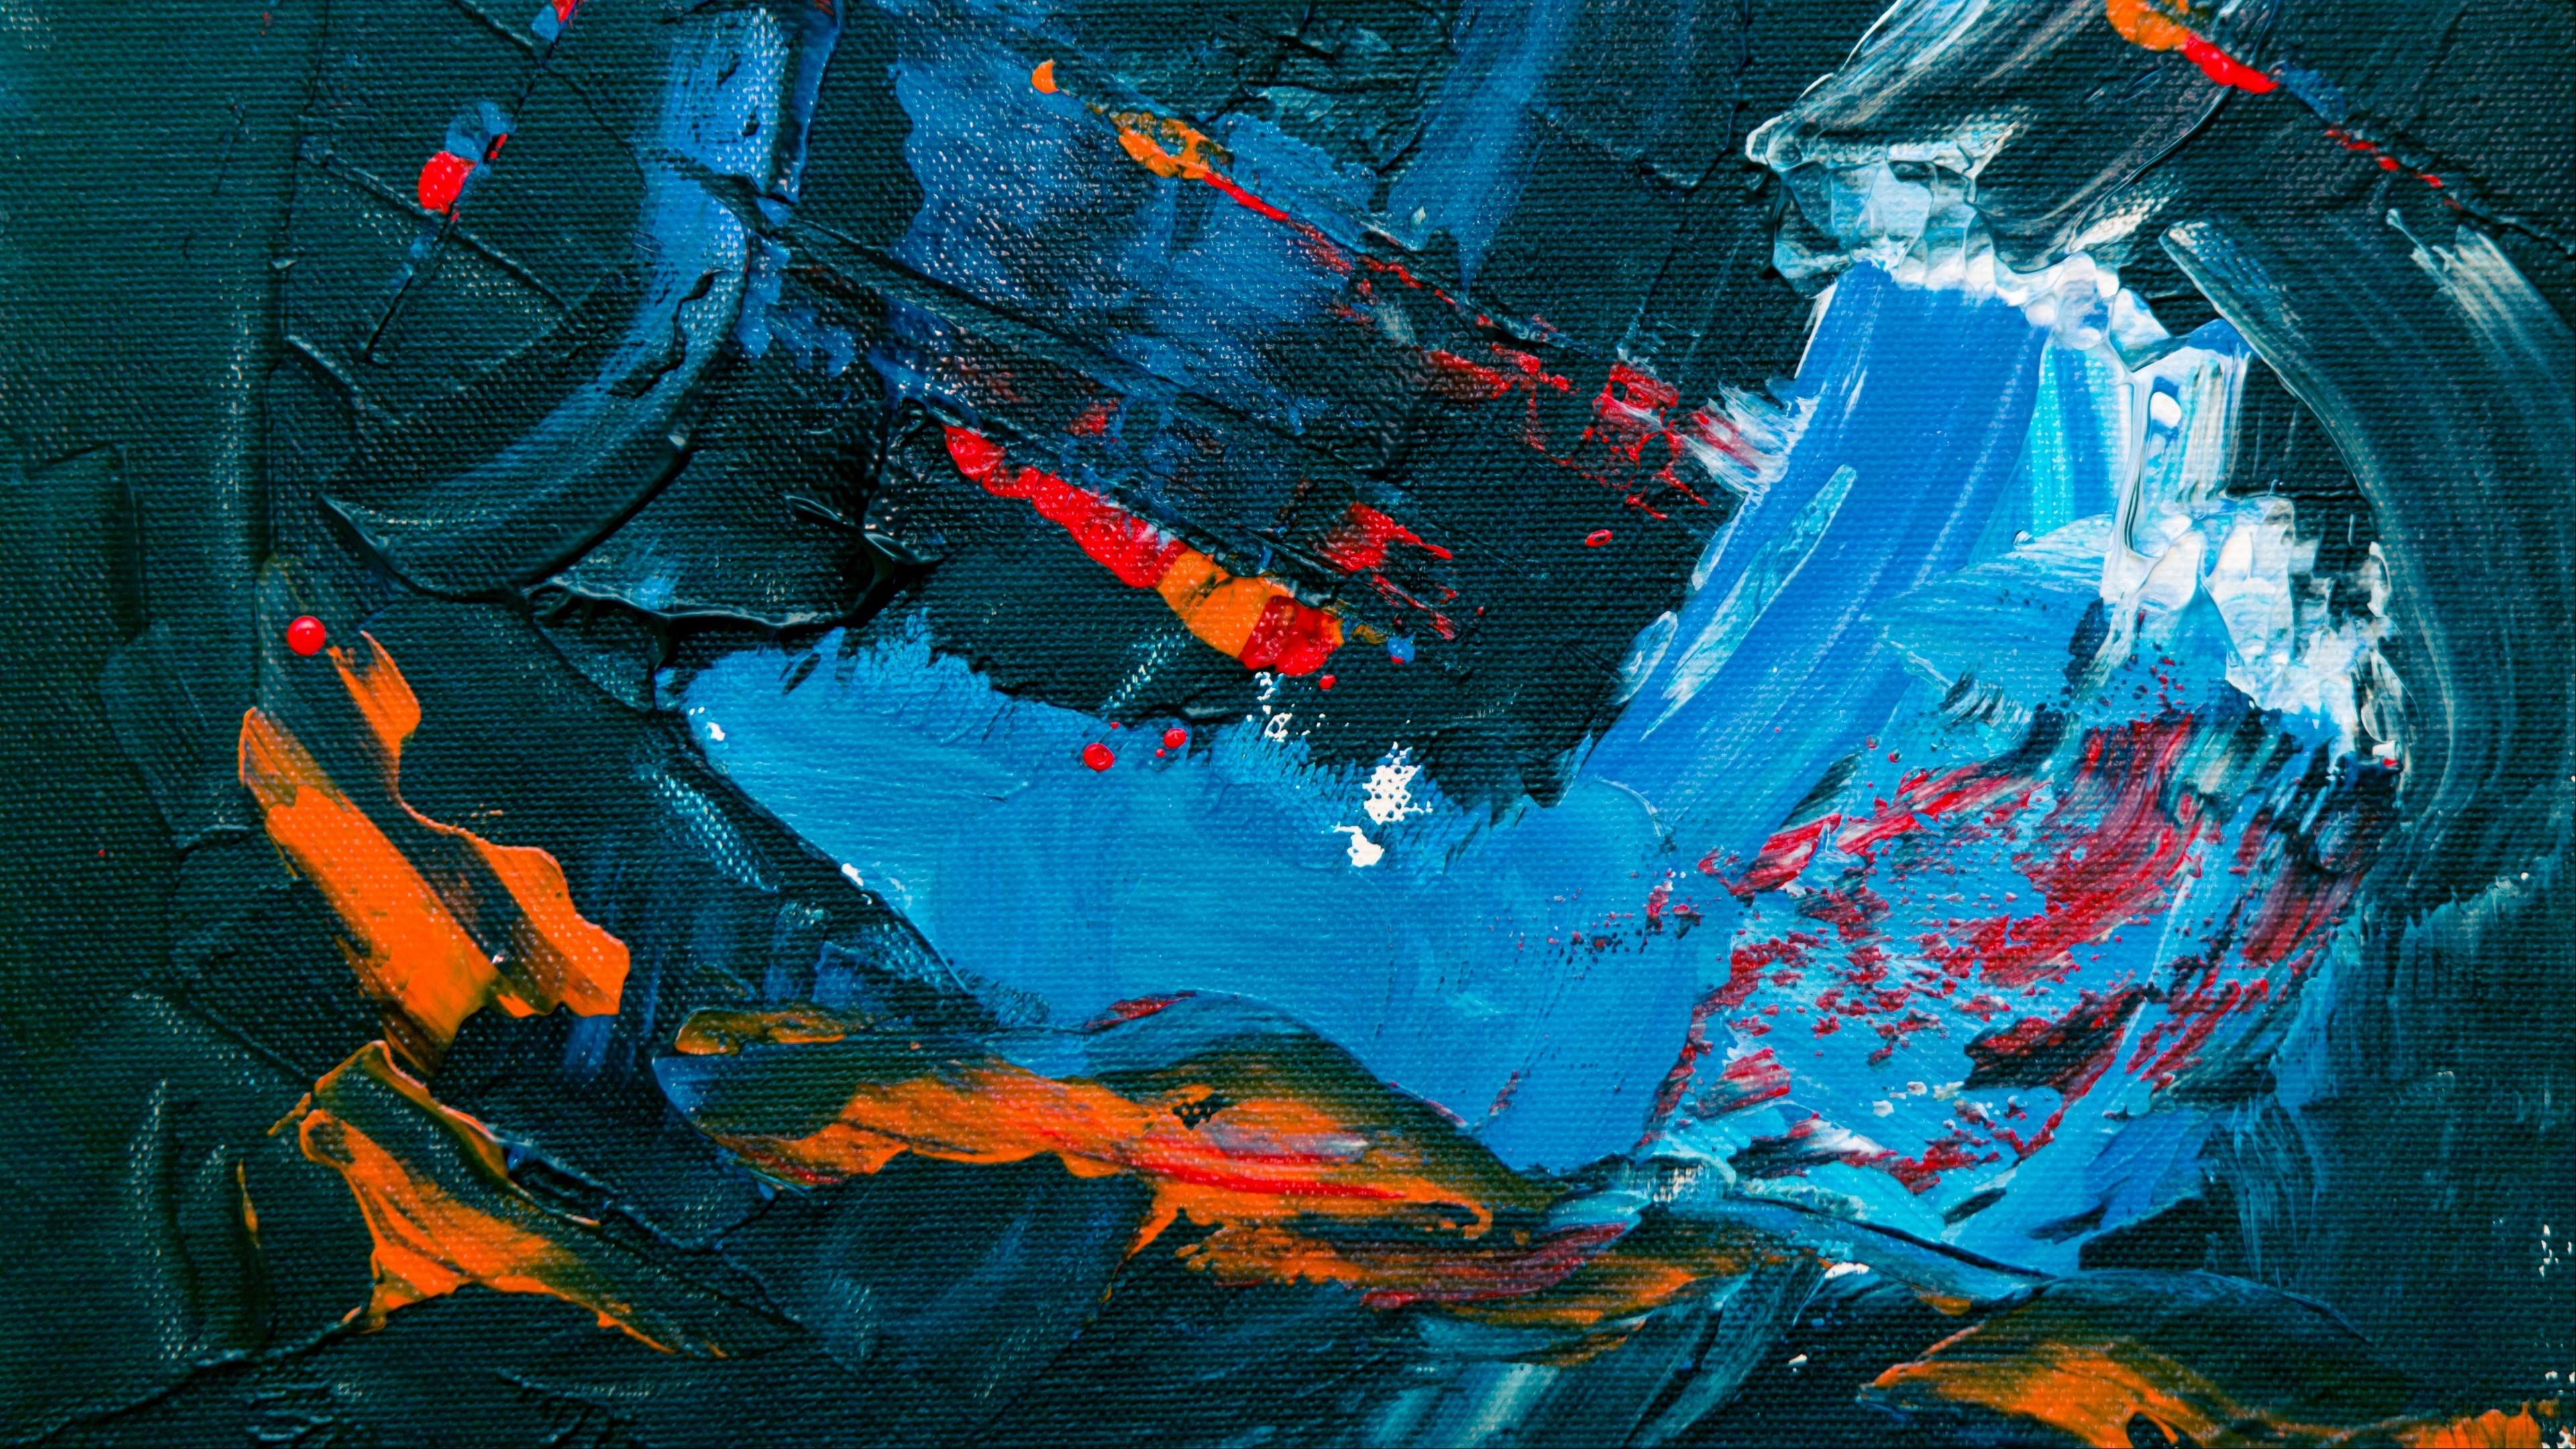 Modern abstract painting artwork wallpaper